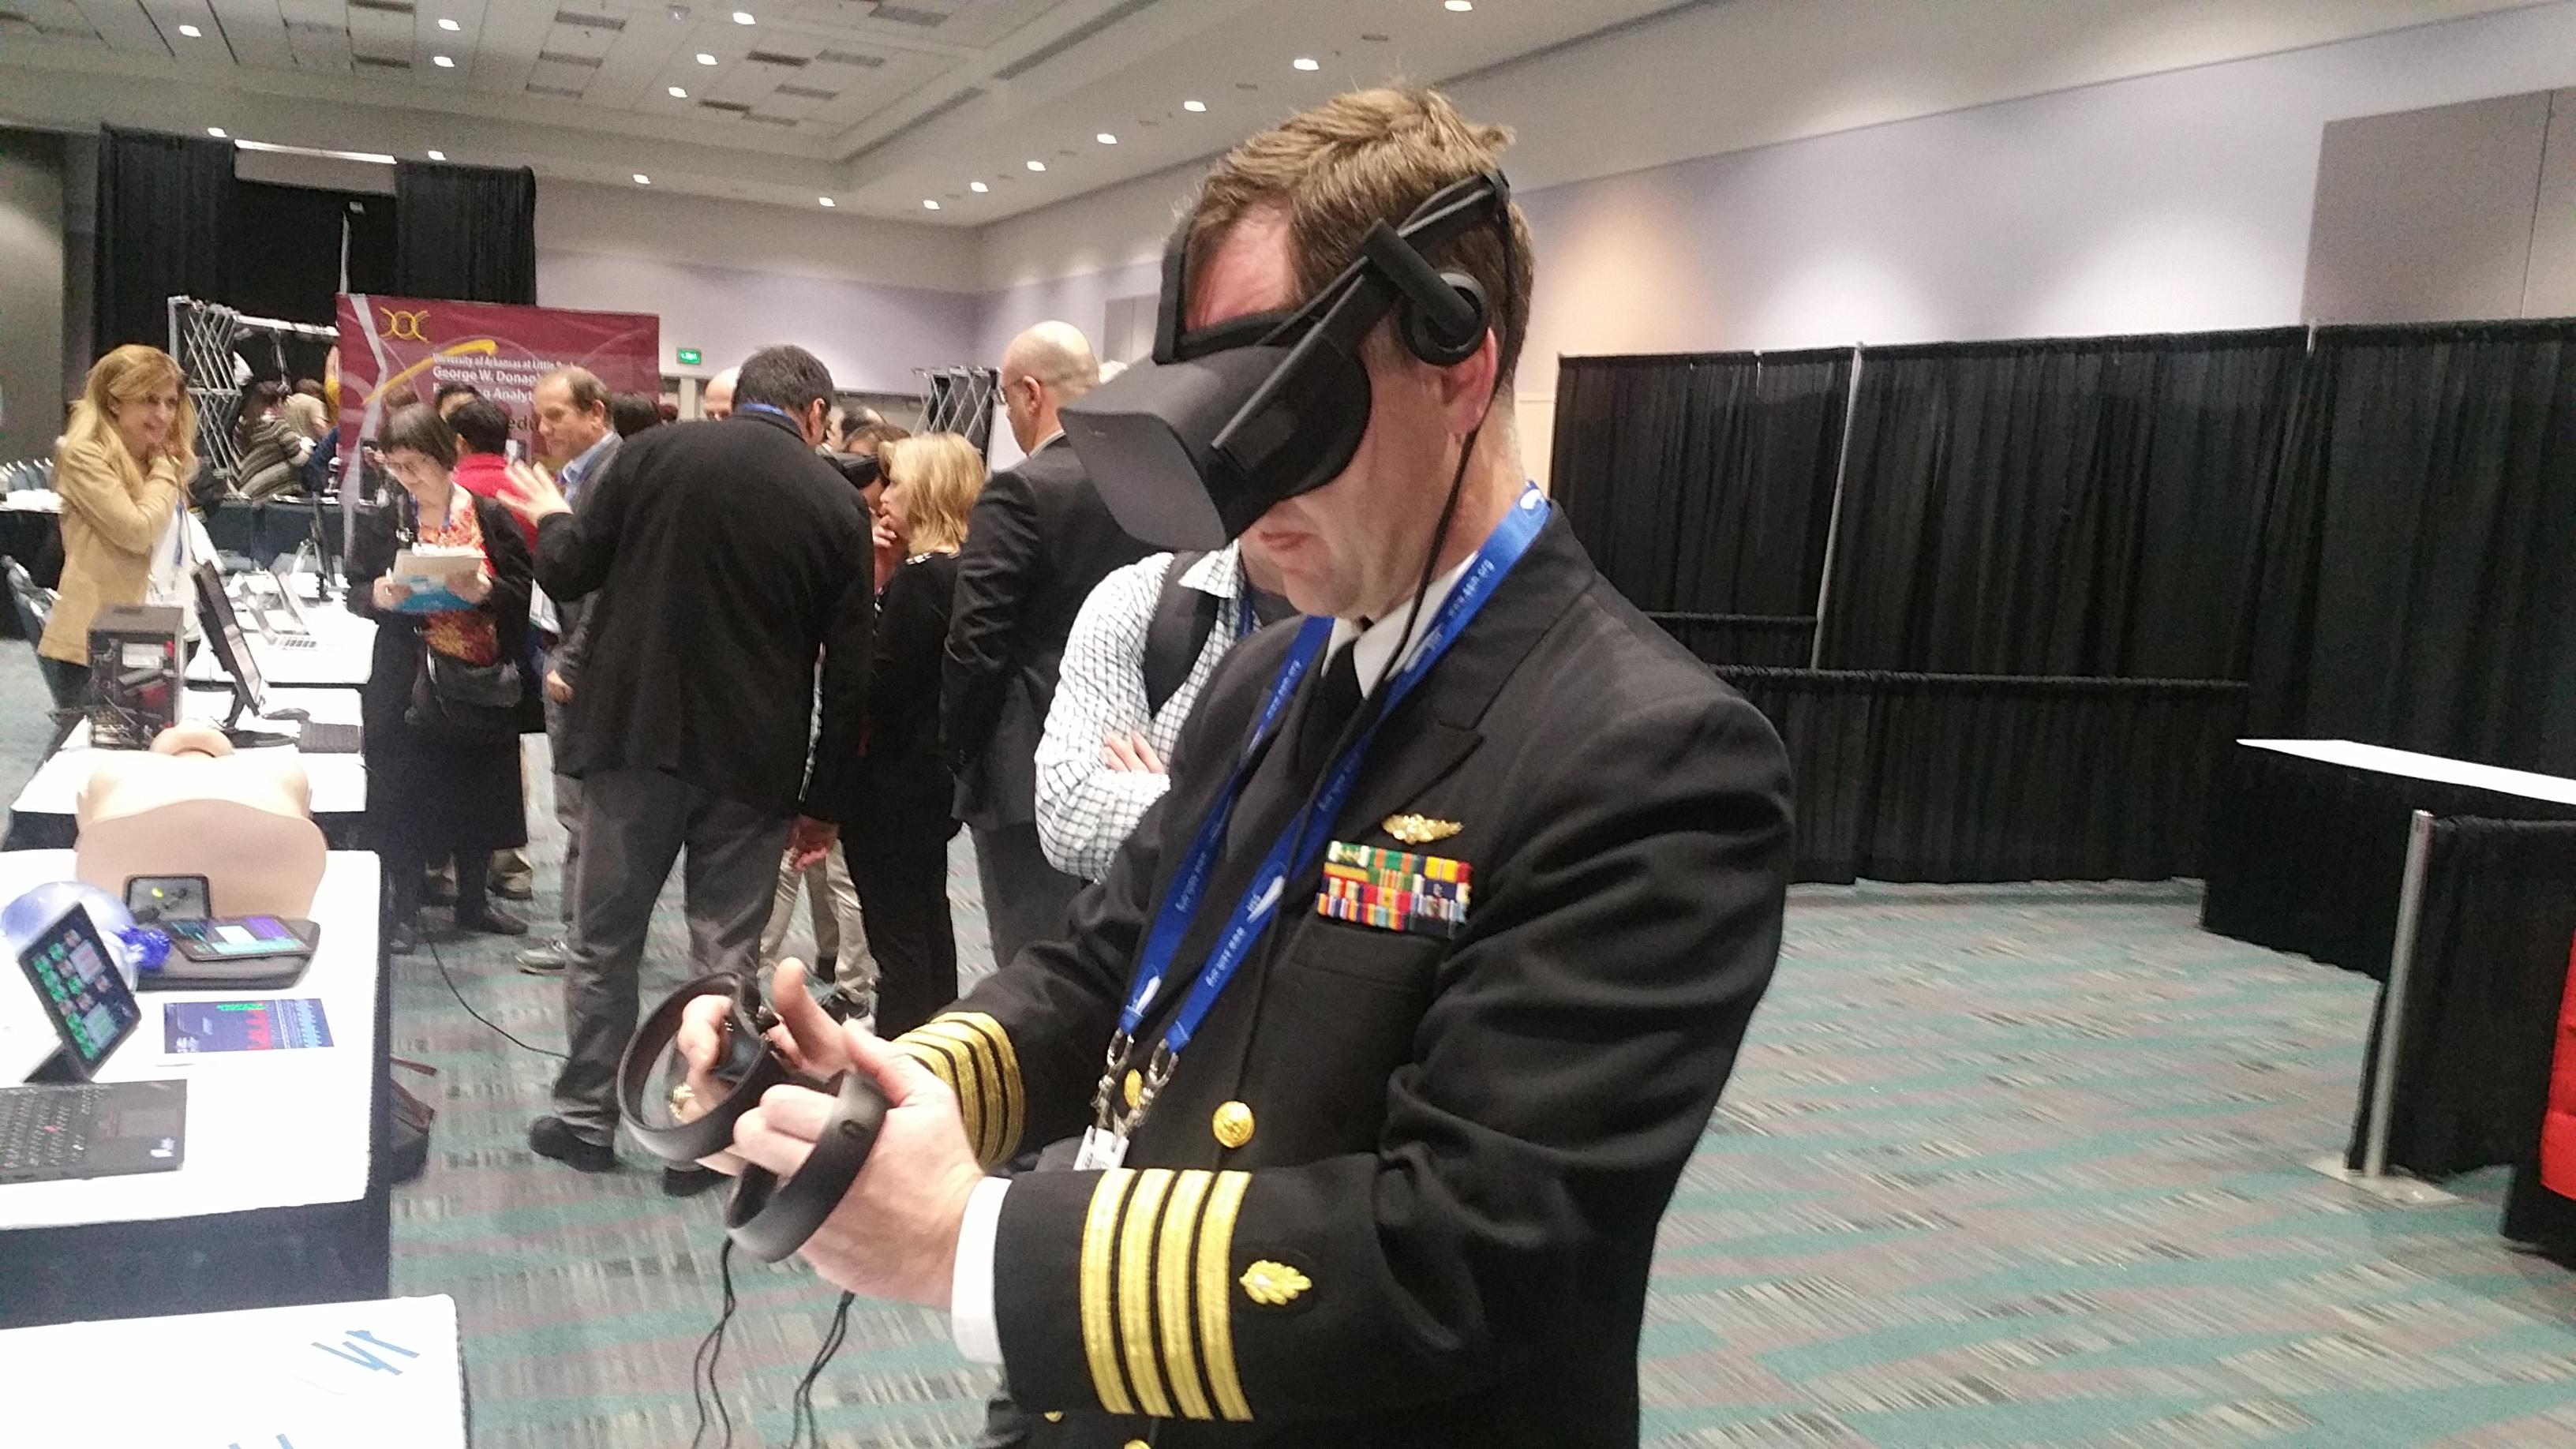 International Meeting on Simulation in Healthcare VR demo Airway Labs